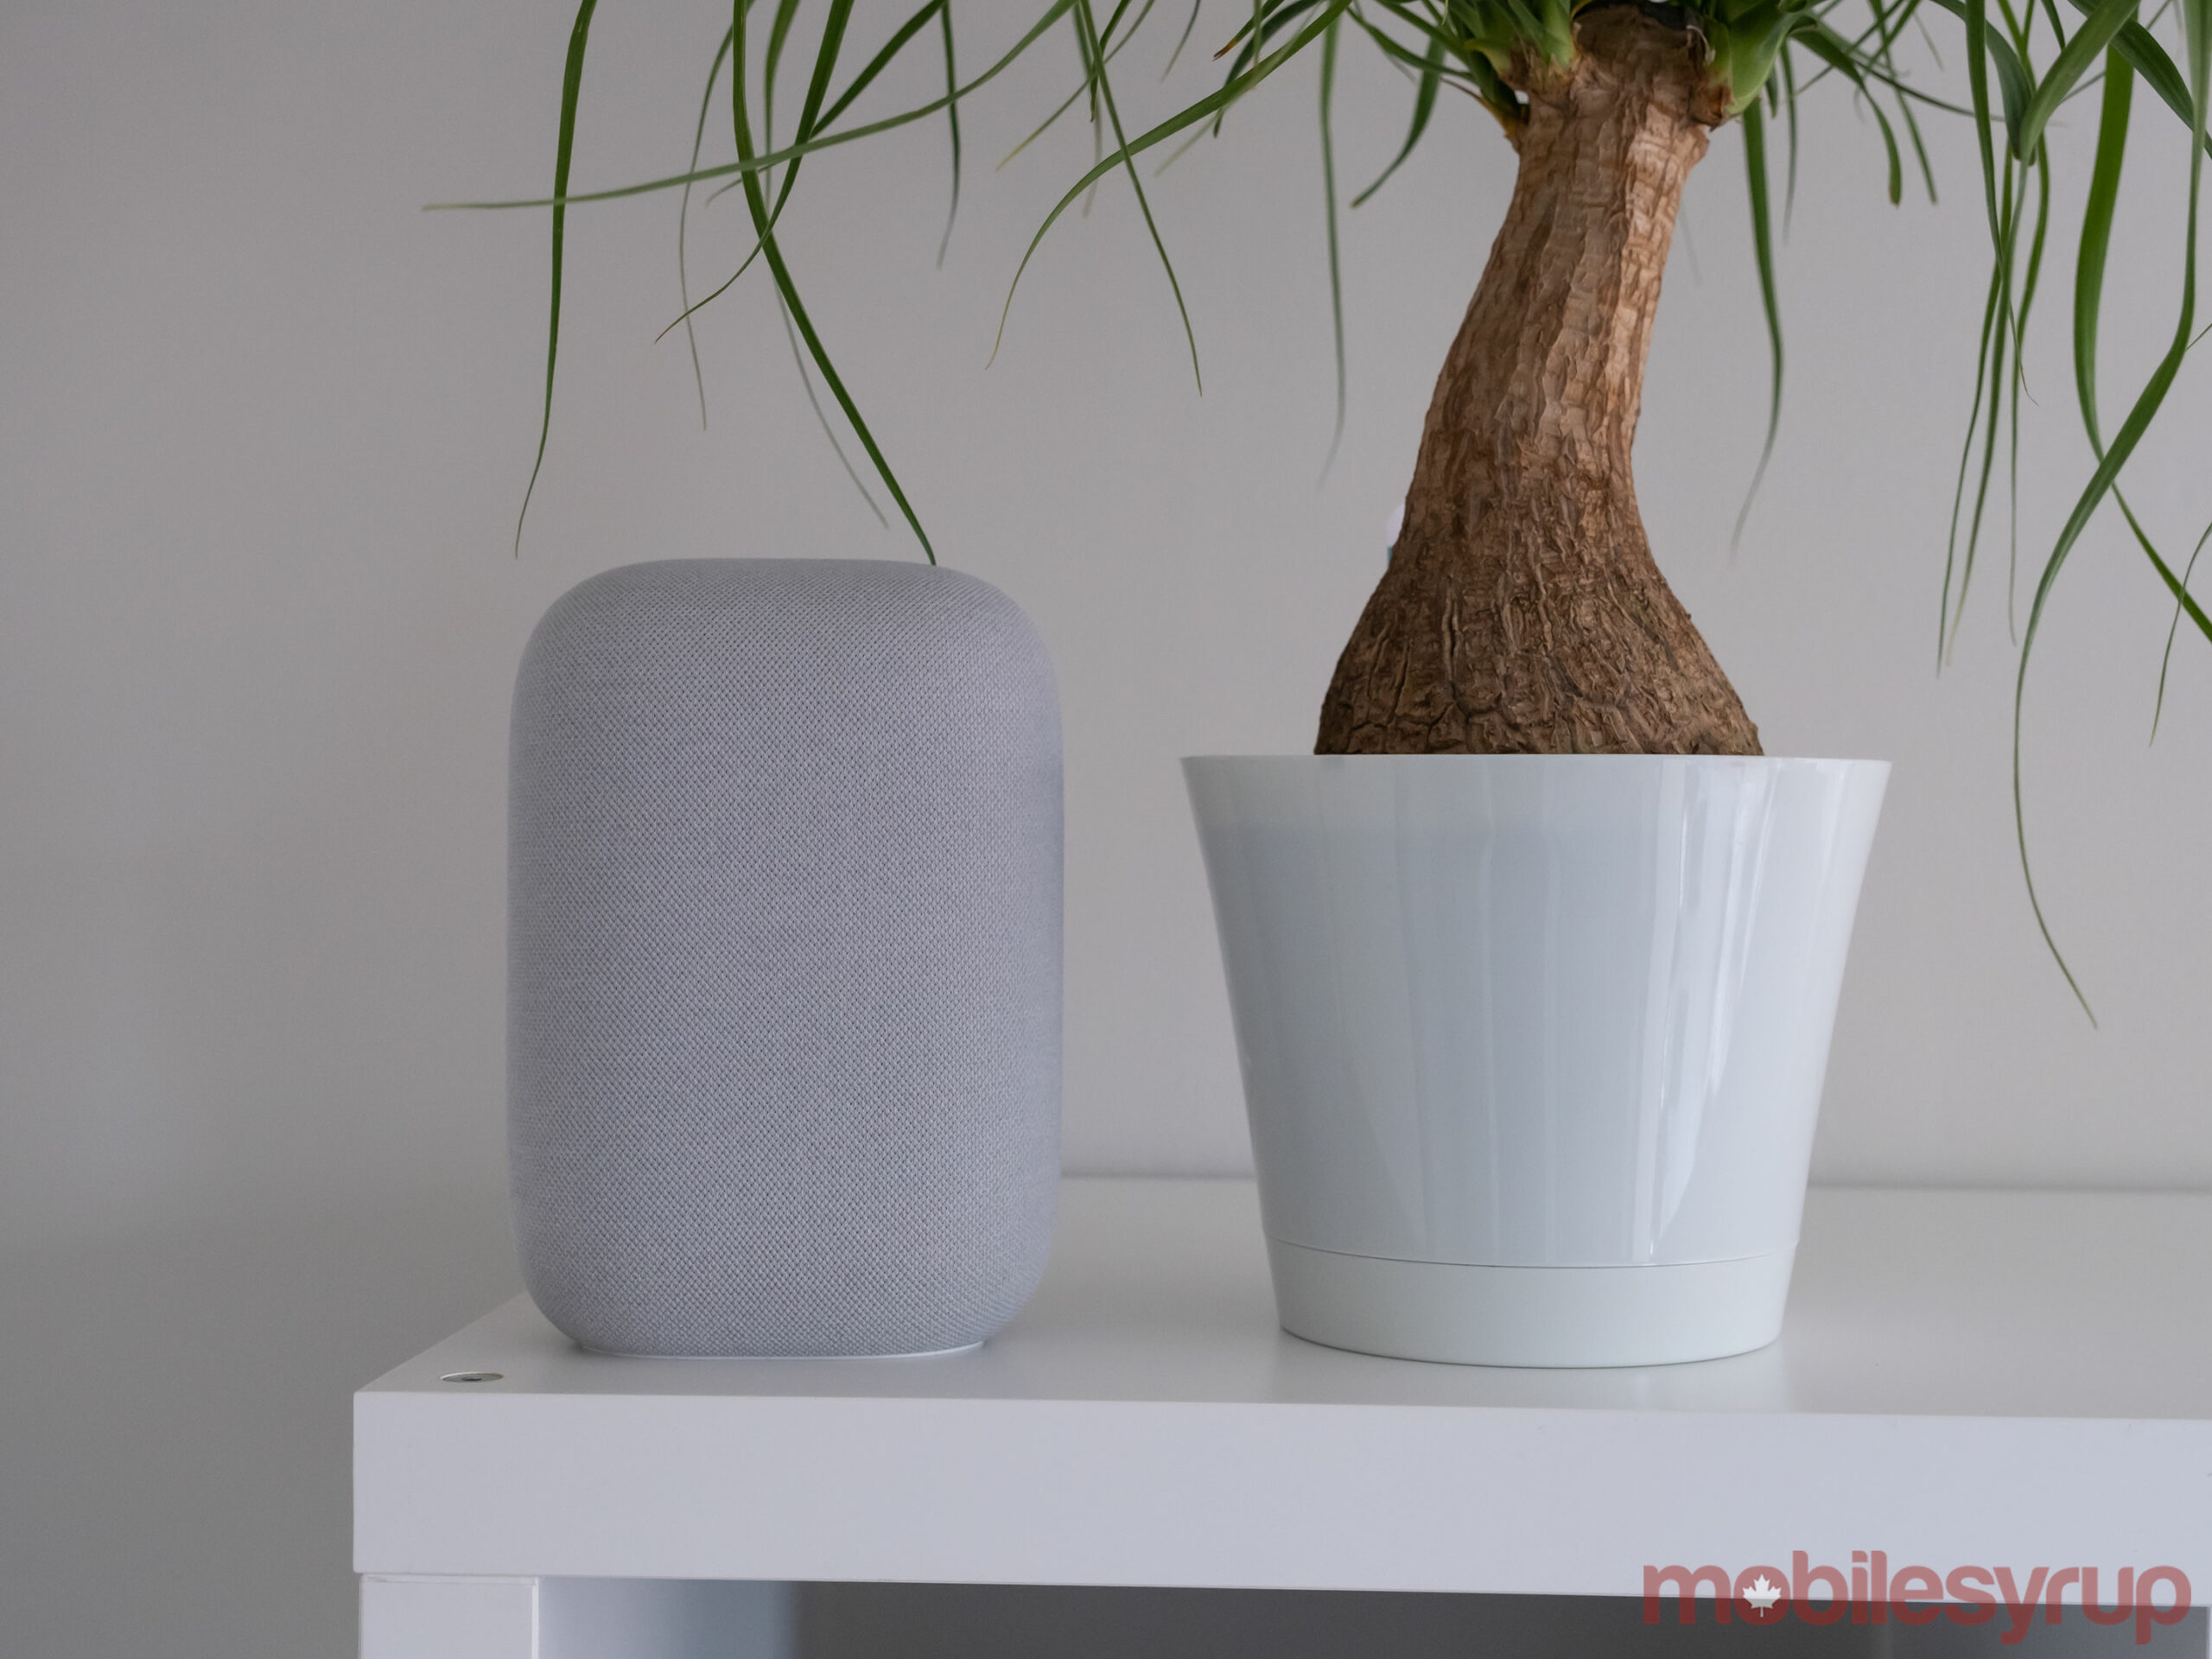 Nest Audio beside palm plant